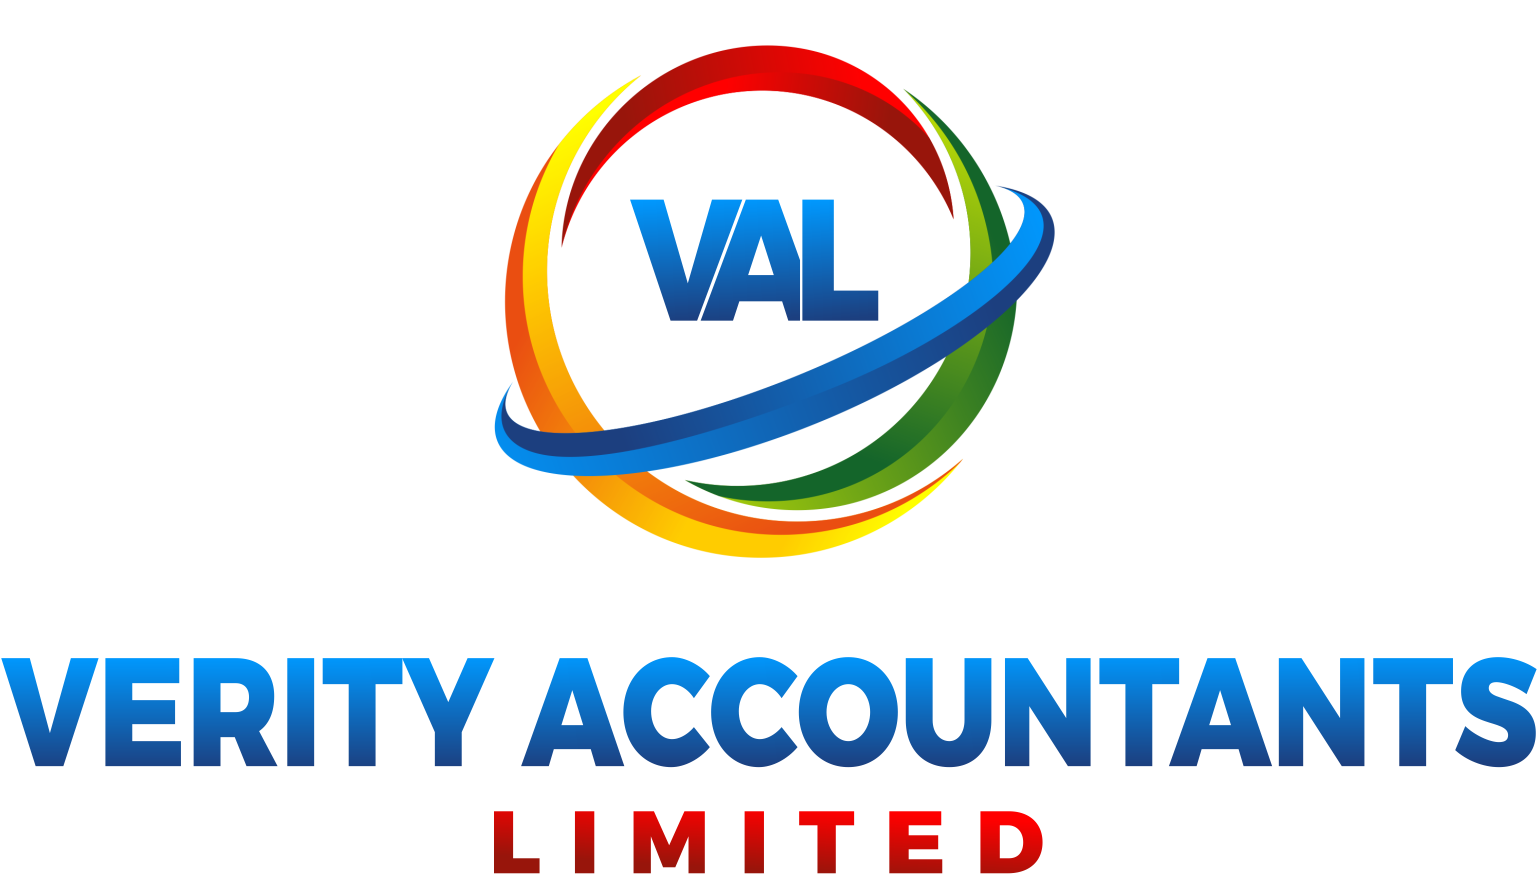 Verity Accountants Ltd